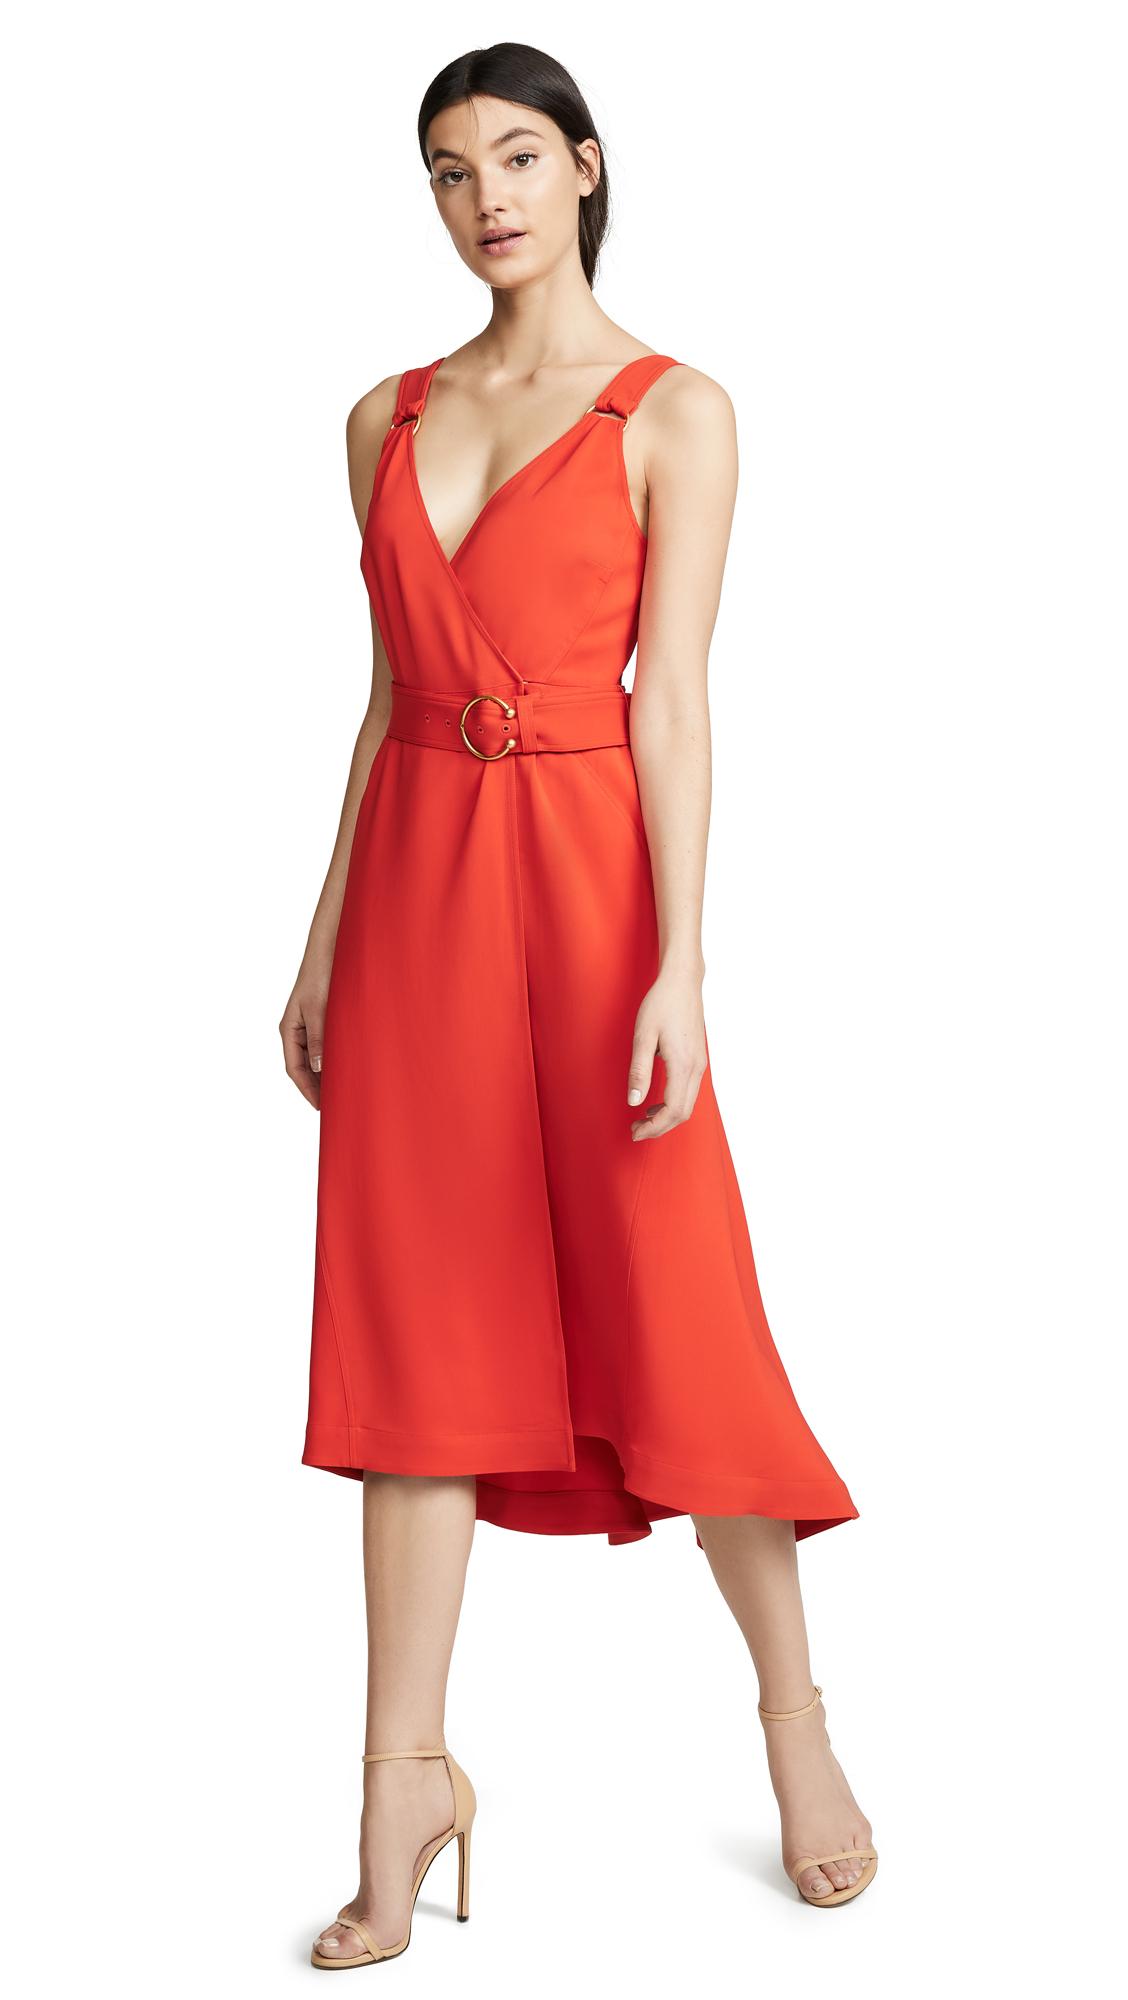 A.L.C. Haley Dress - Poppy